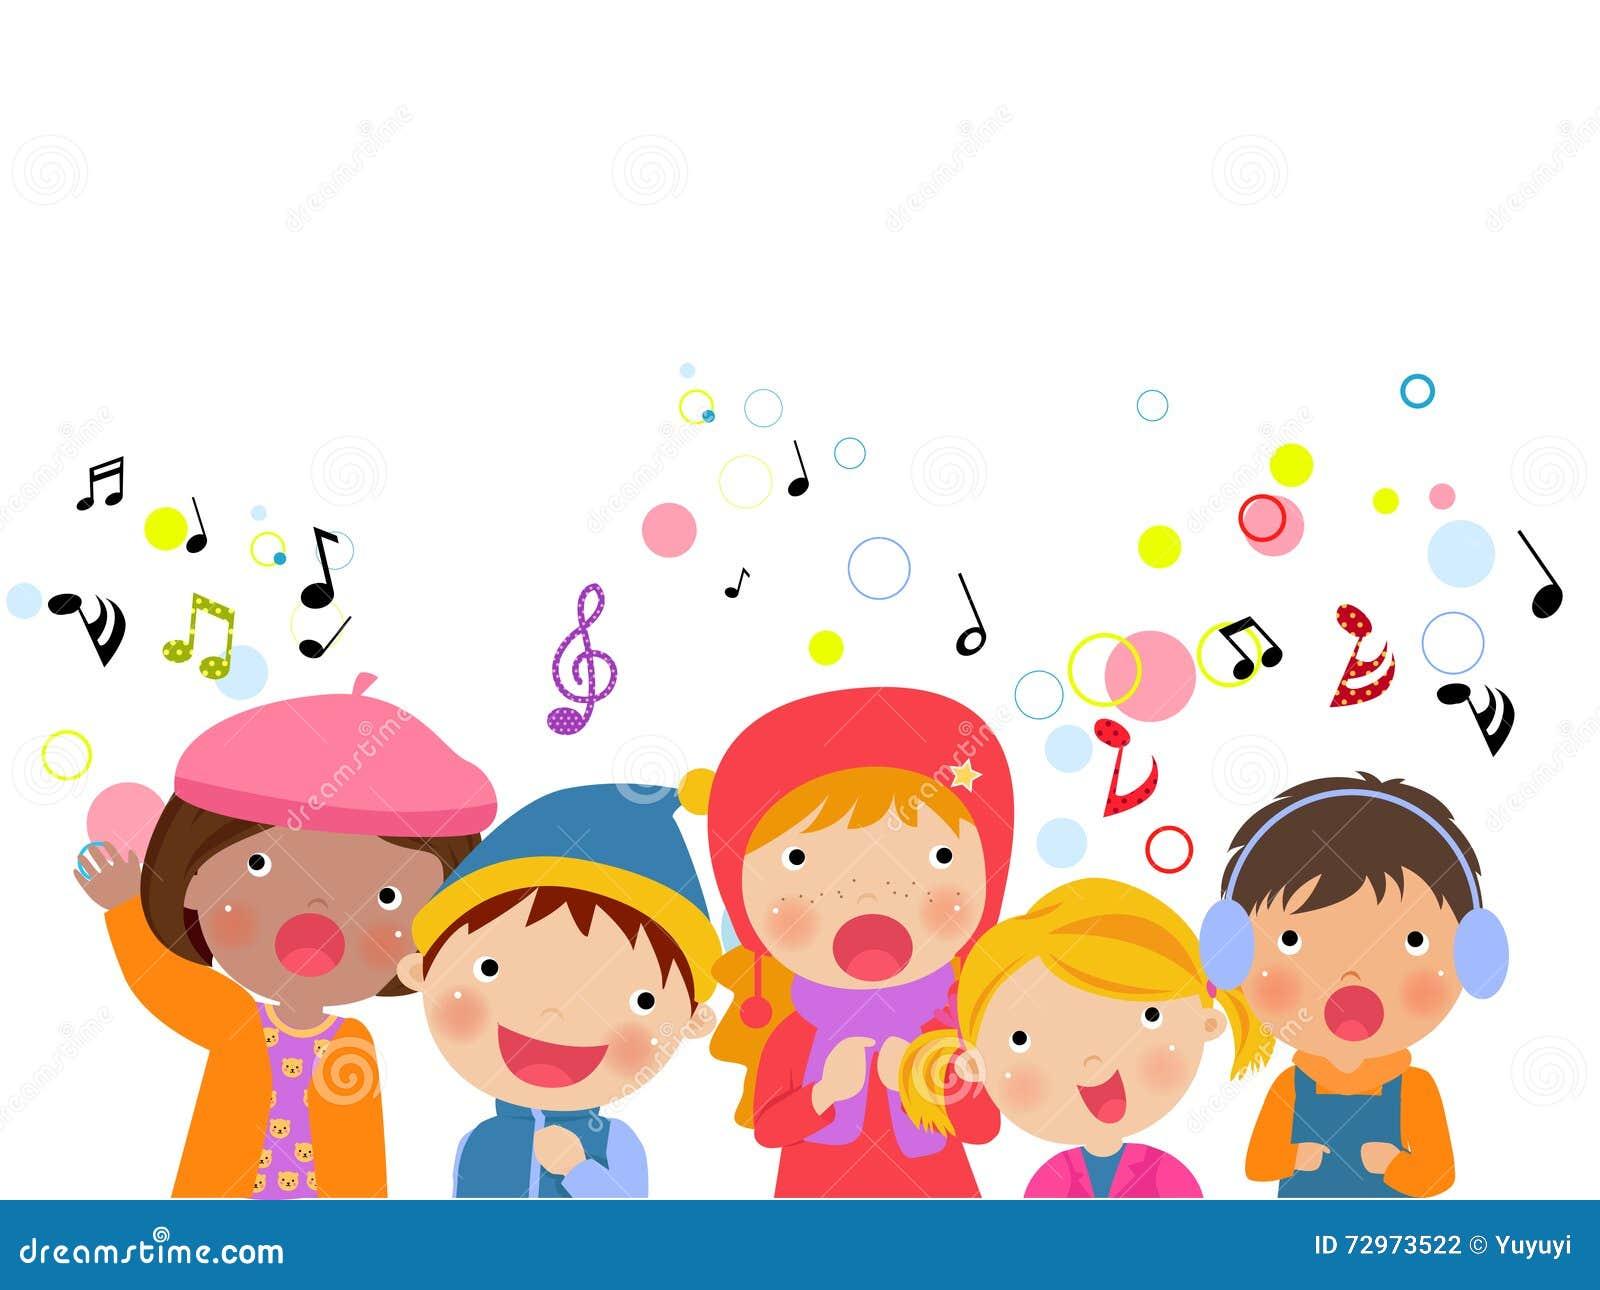 Chorus Stock Illustrations – 813 Chorus Stock Illustrations, Vectors ...